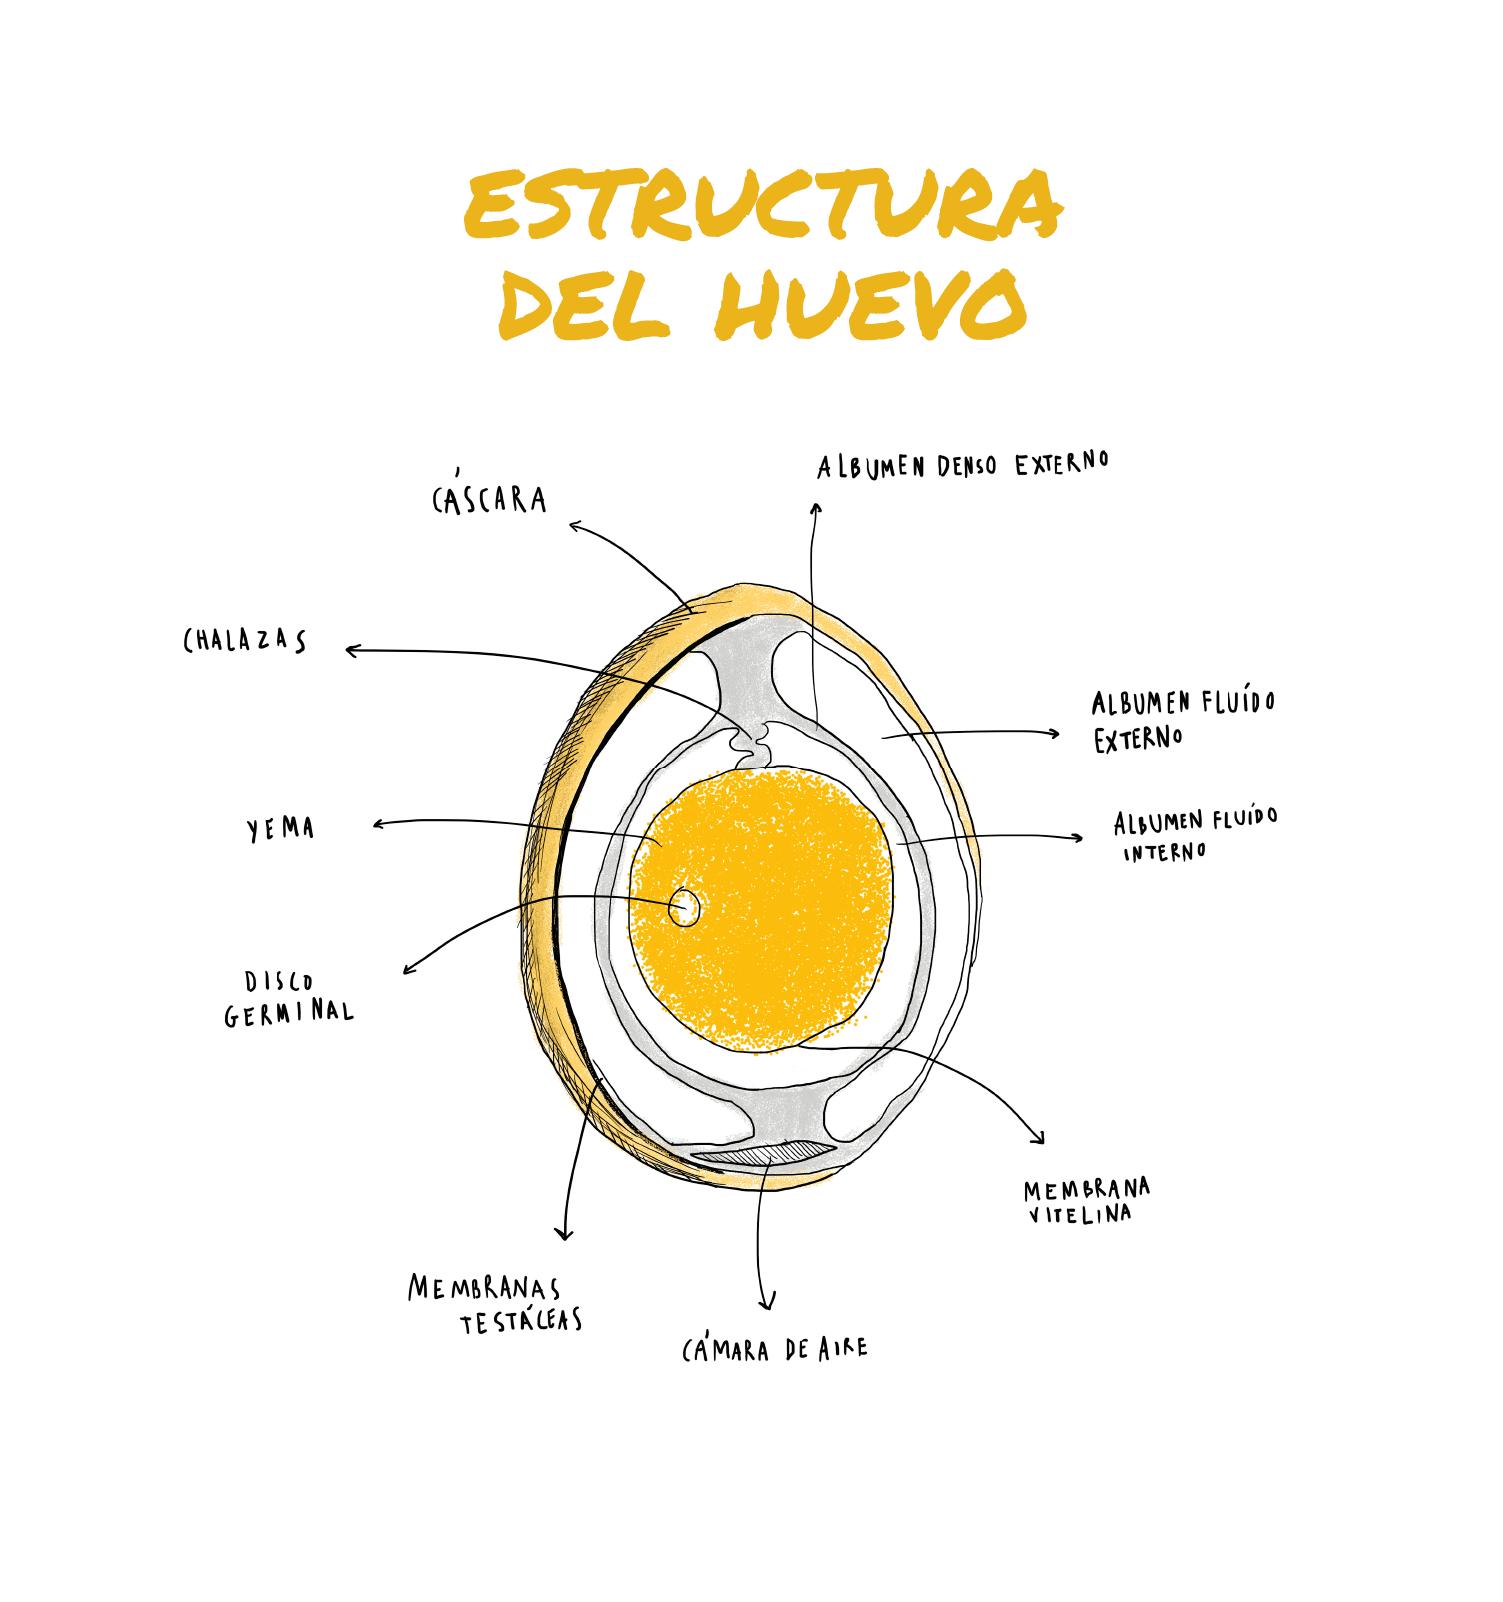 Estructura Instituto De Estudios Del Huevo